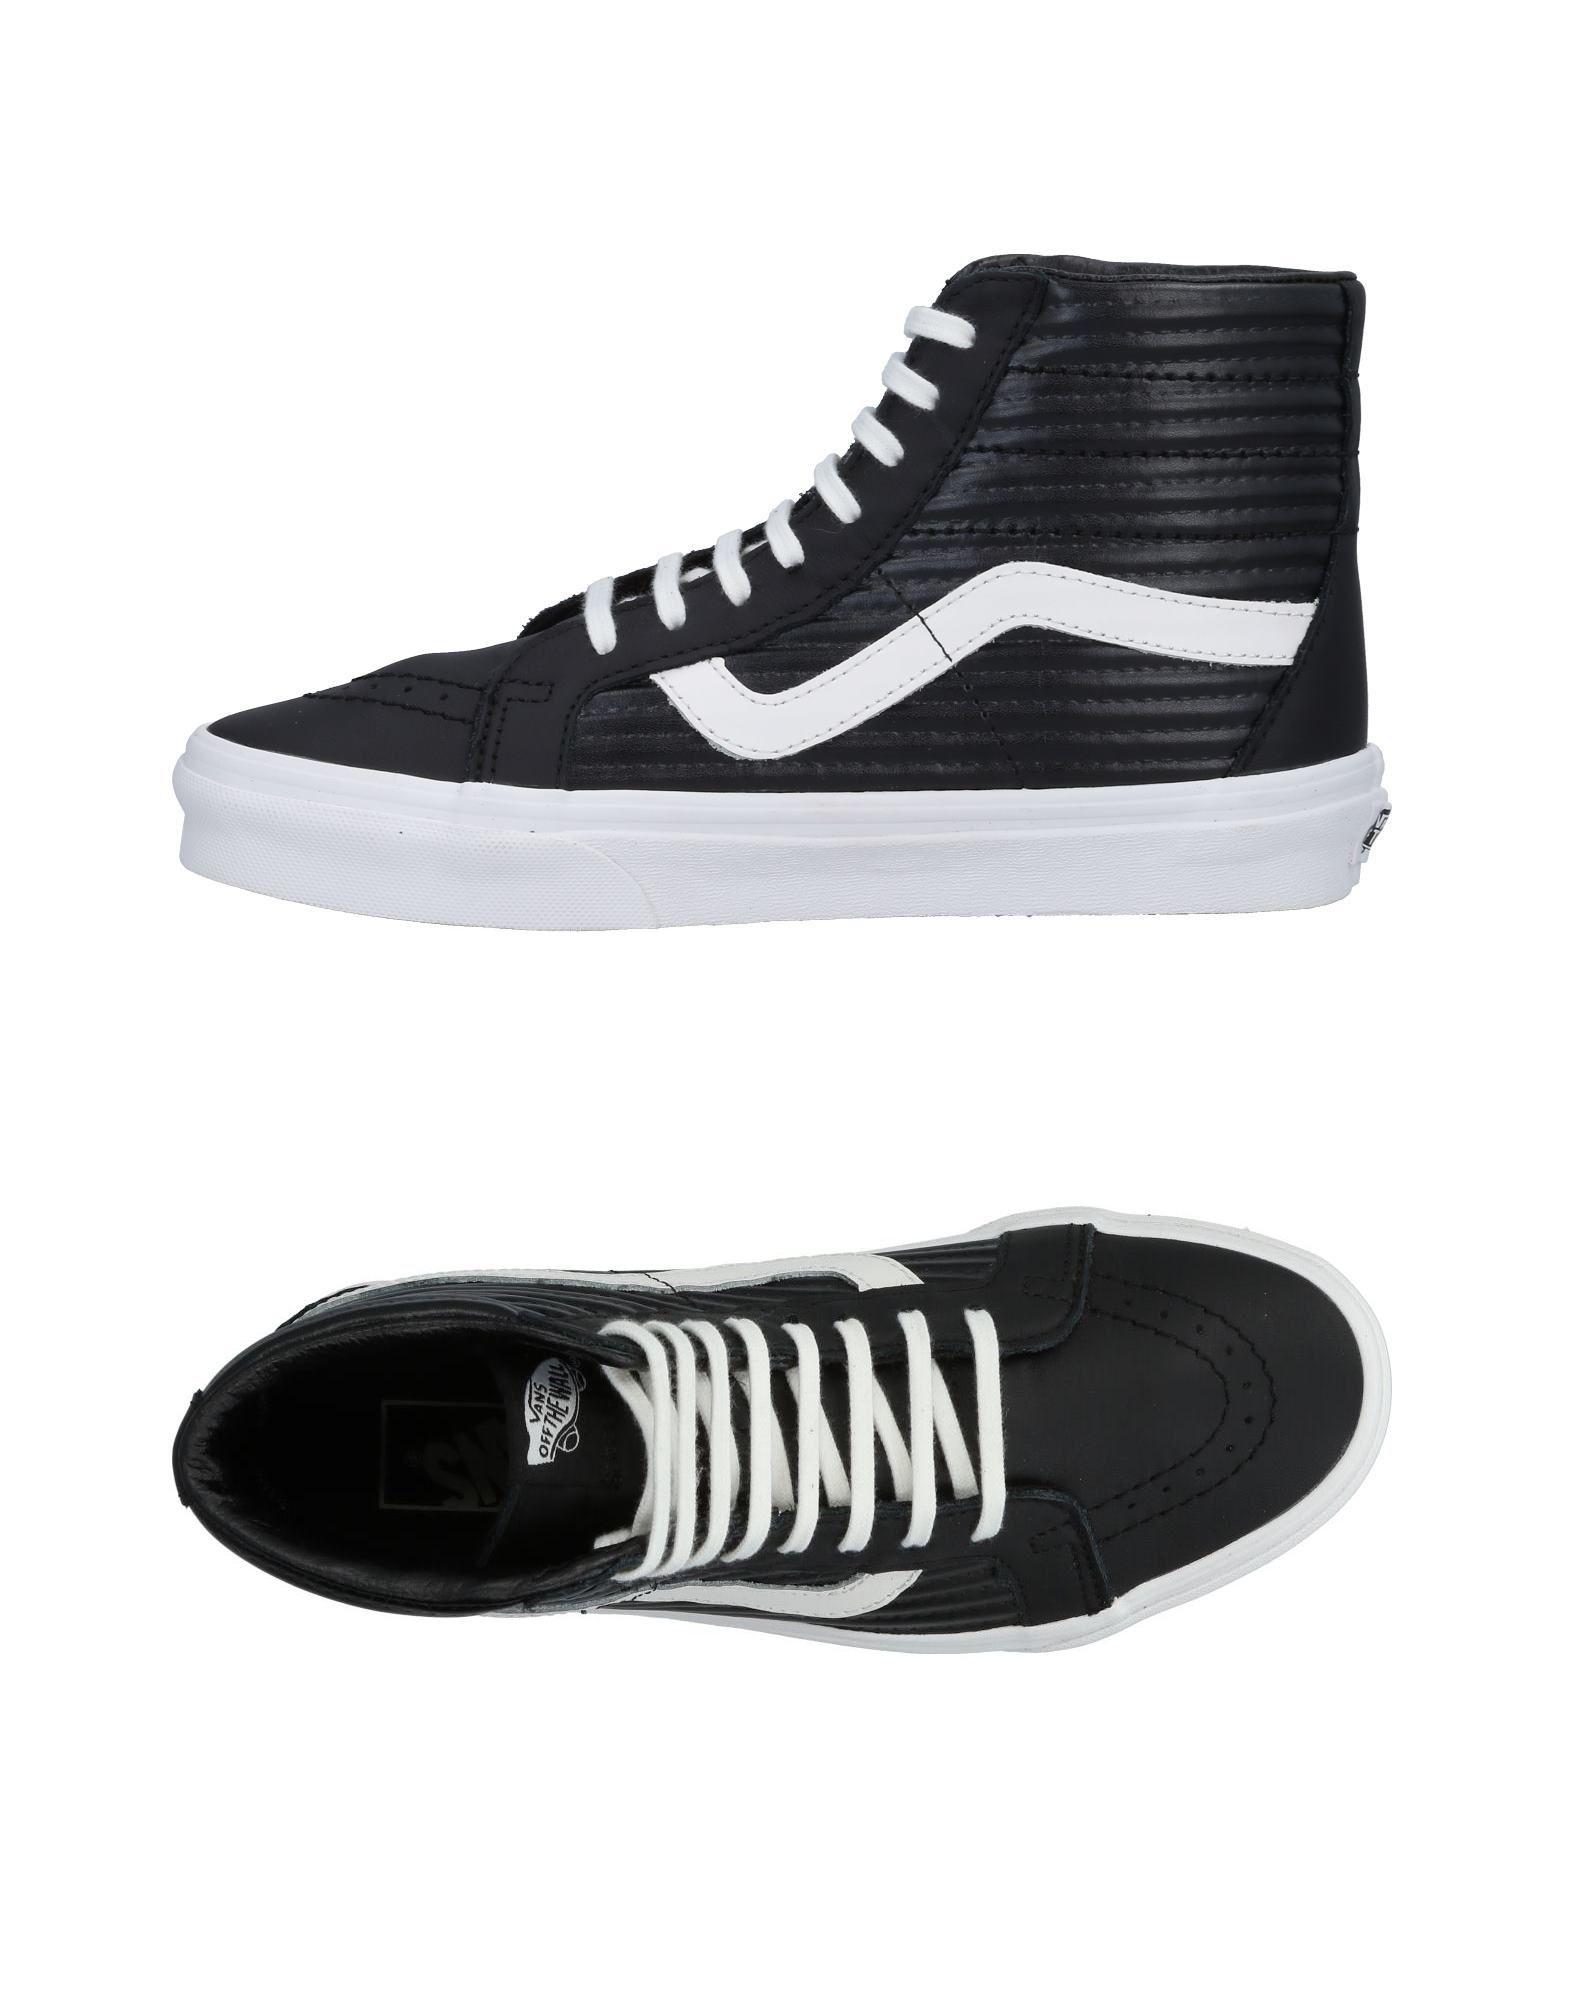 Moda 11495524RF Sneakers Vans Donna - 11495524RF Moda 67c383